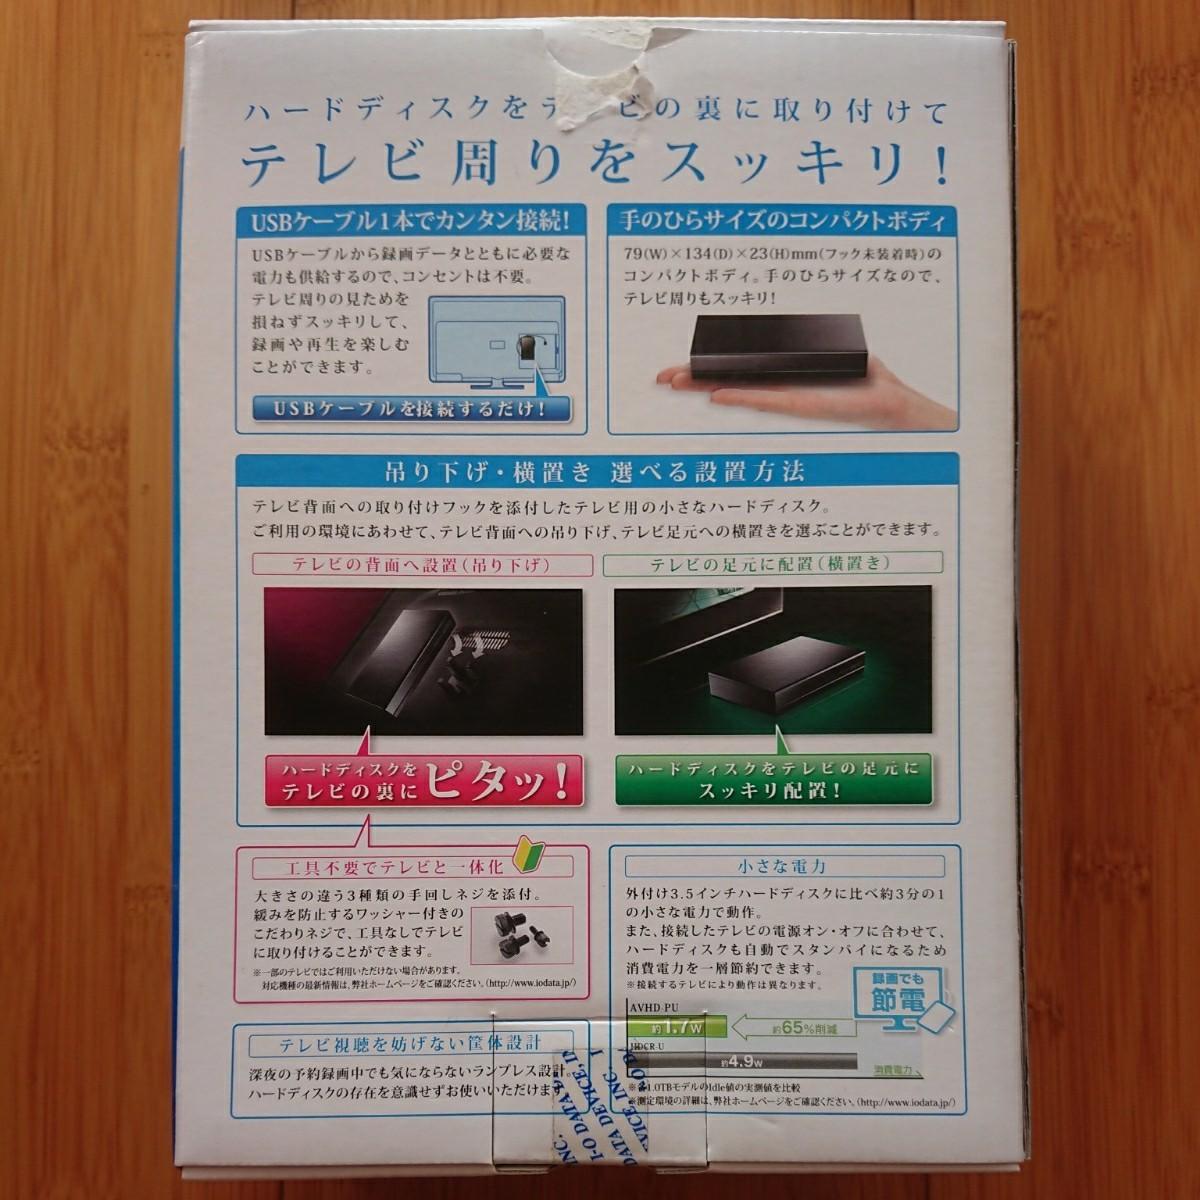 I-O DATA テレビ録画対応 ポータブルHDD 500GB TV背面取付フック付きモデル(AVHD-P500U)